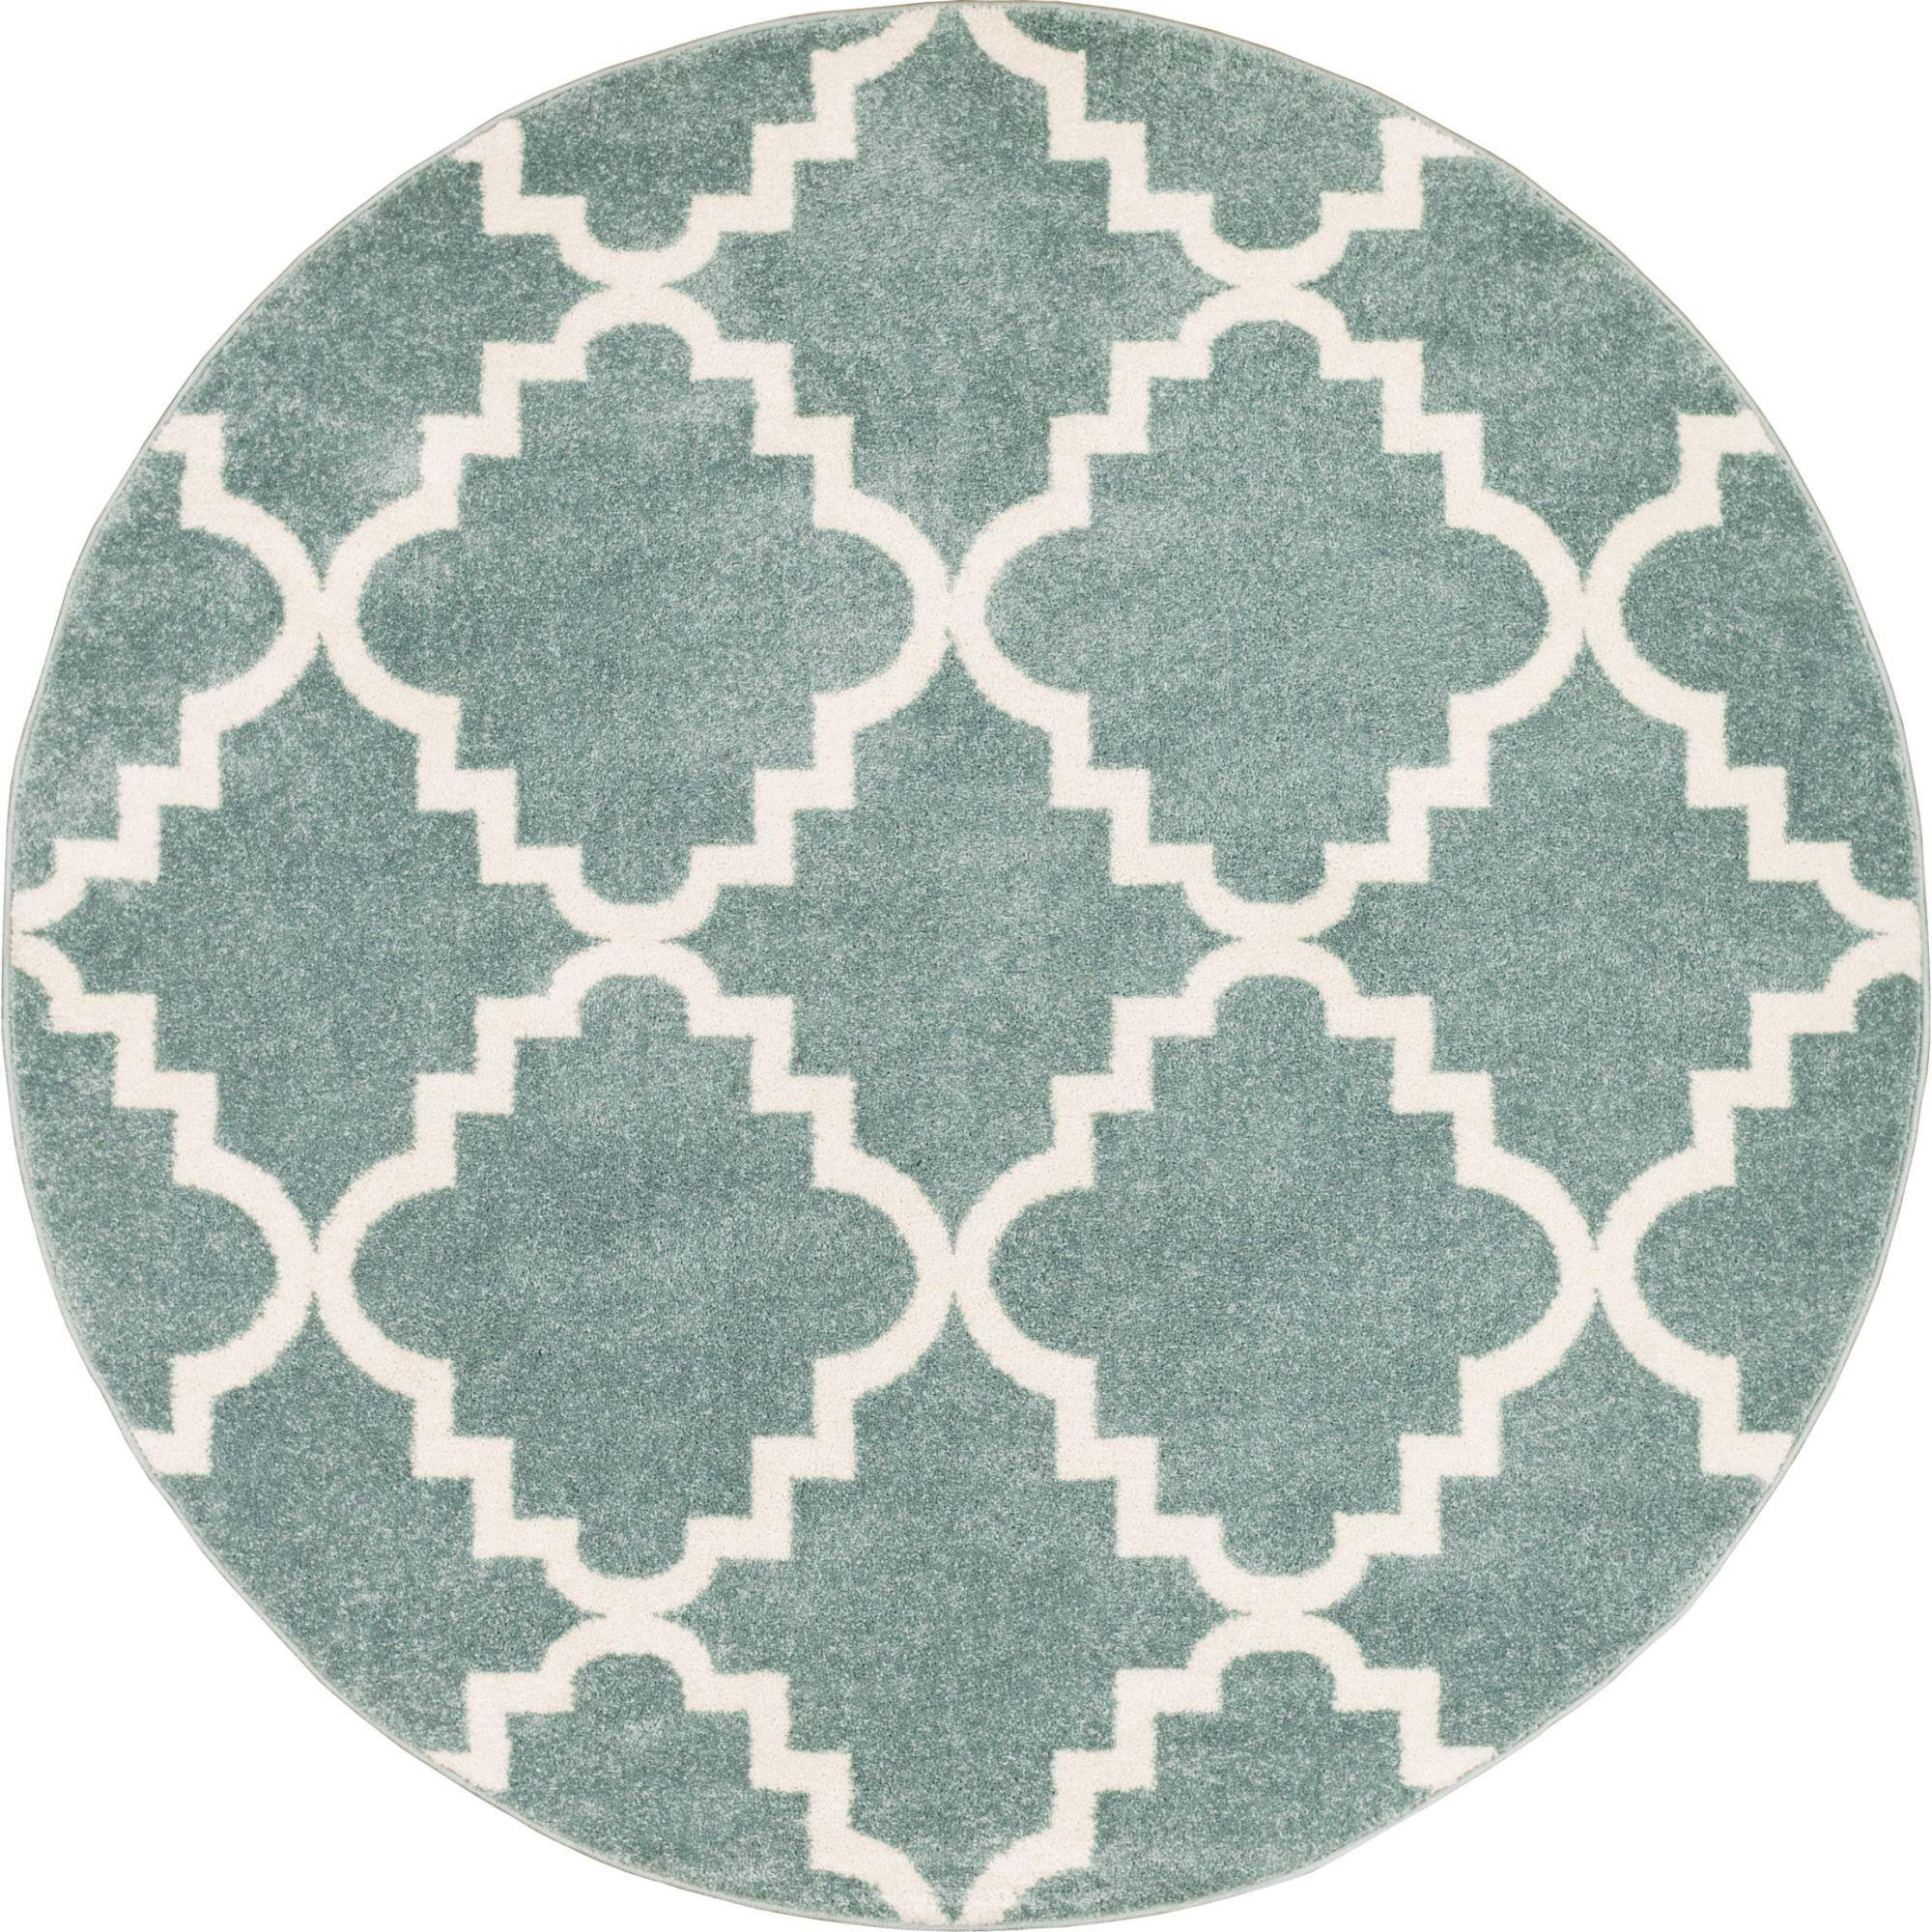 Ozzie Lattice Light Blue Area Rug Rug Size: Round 5'3